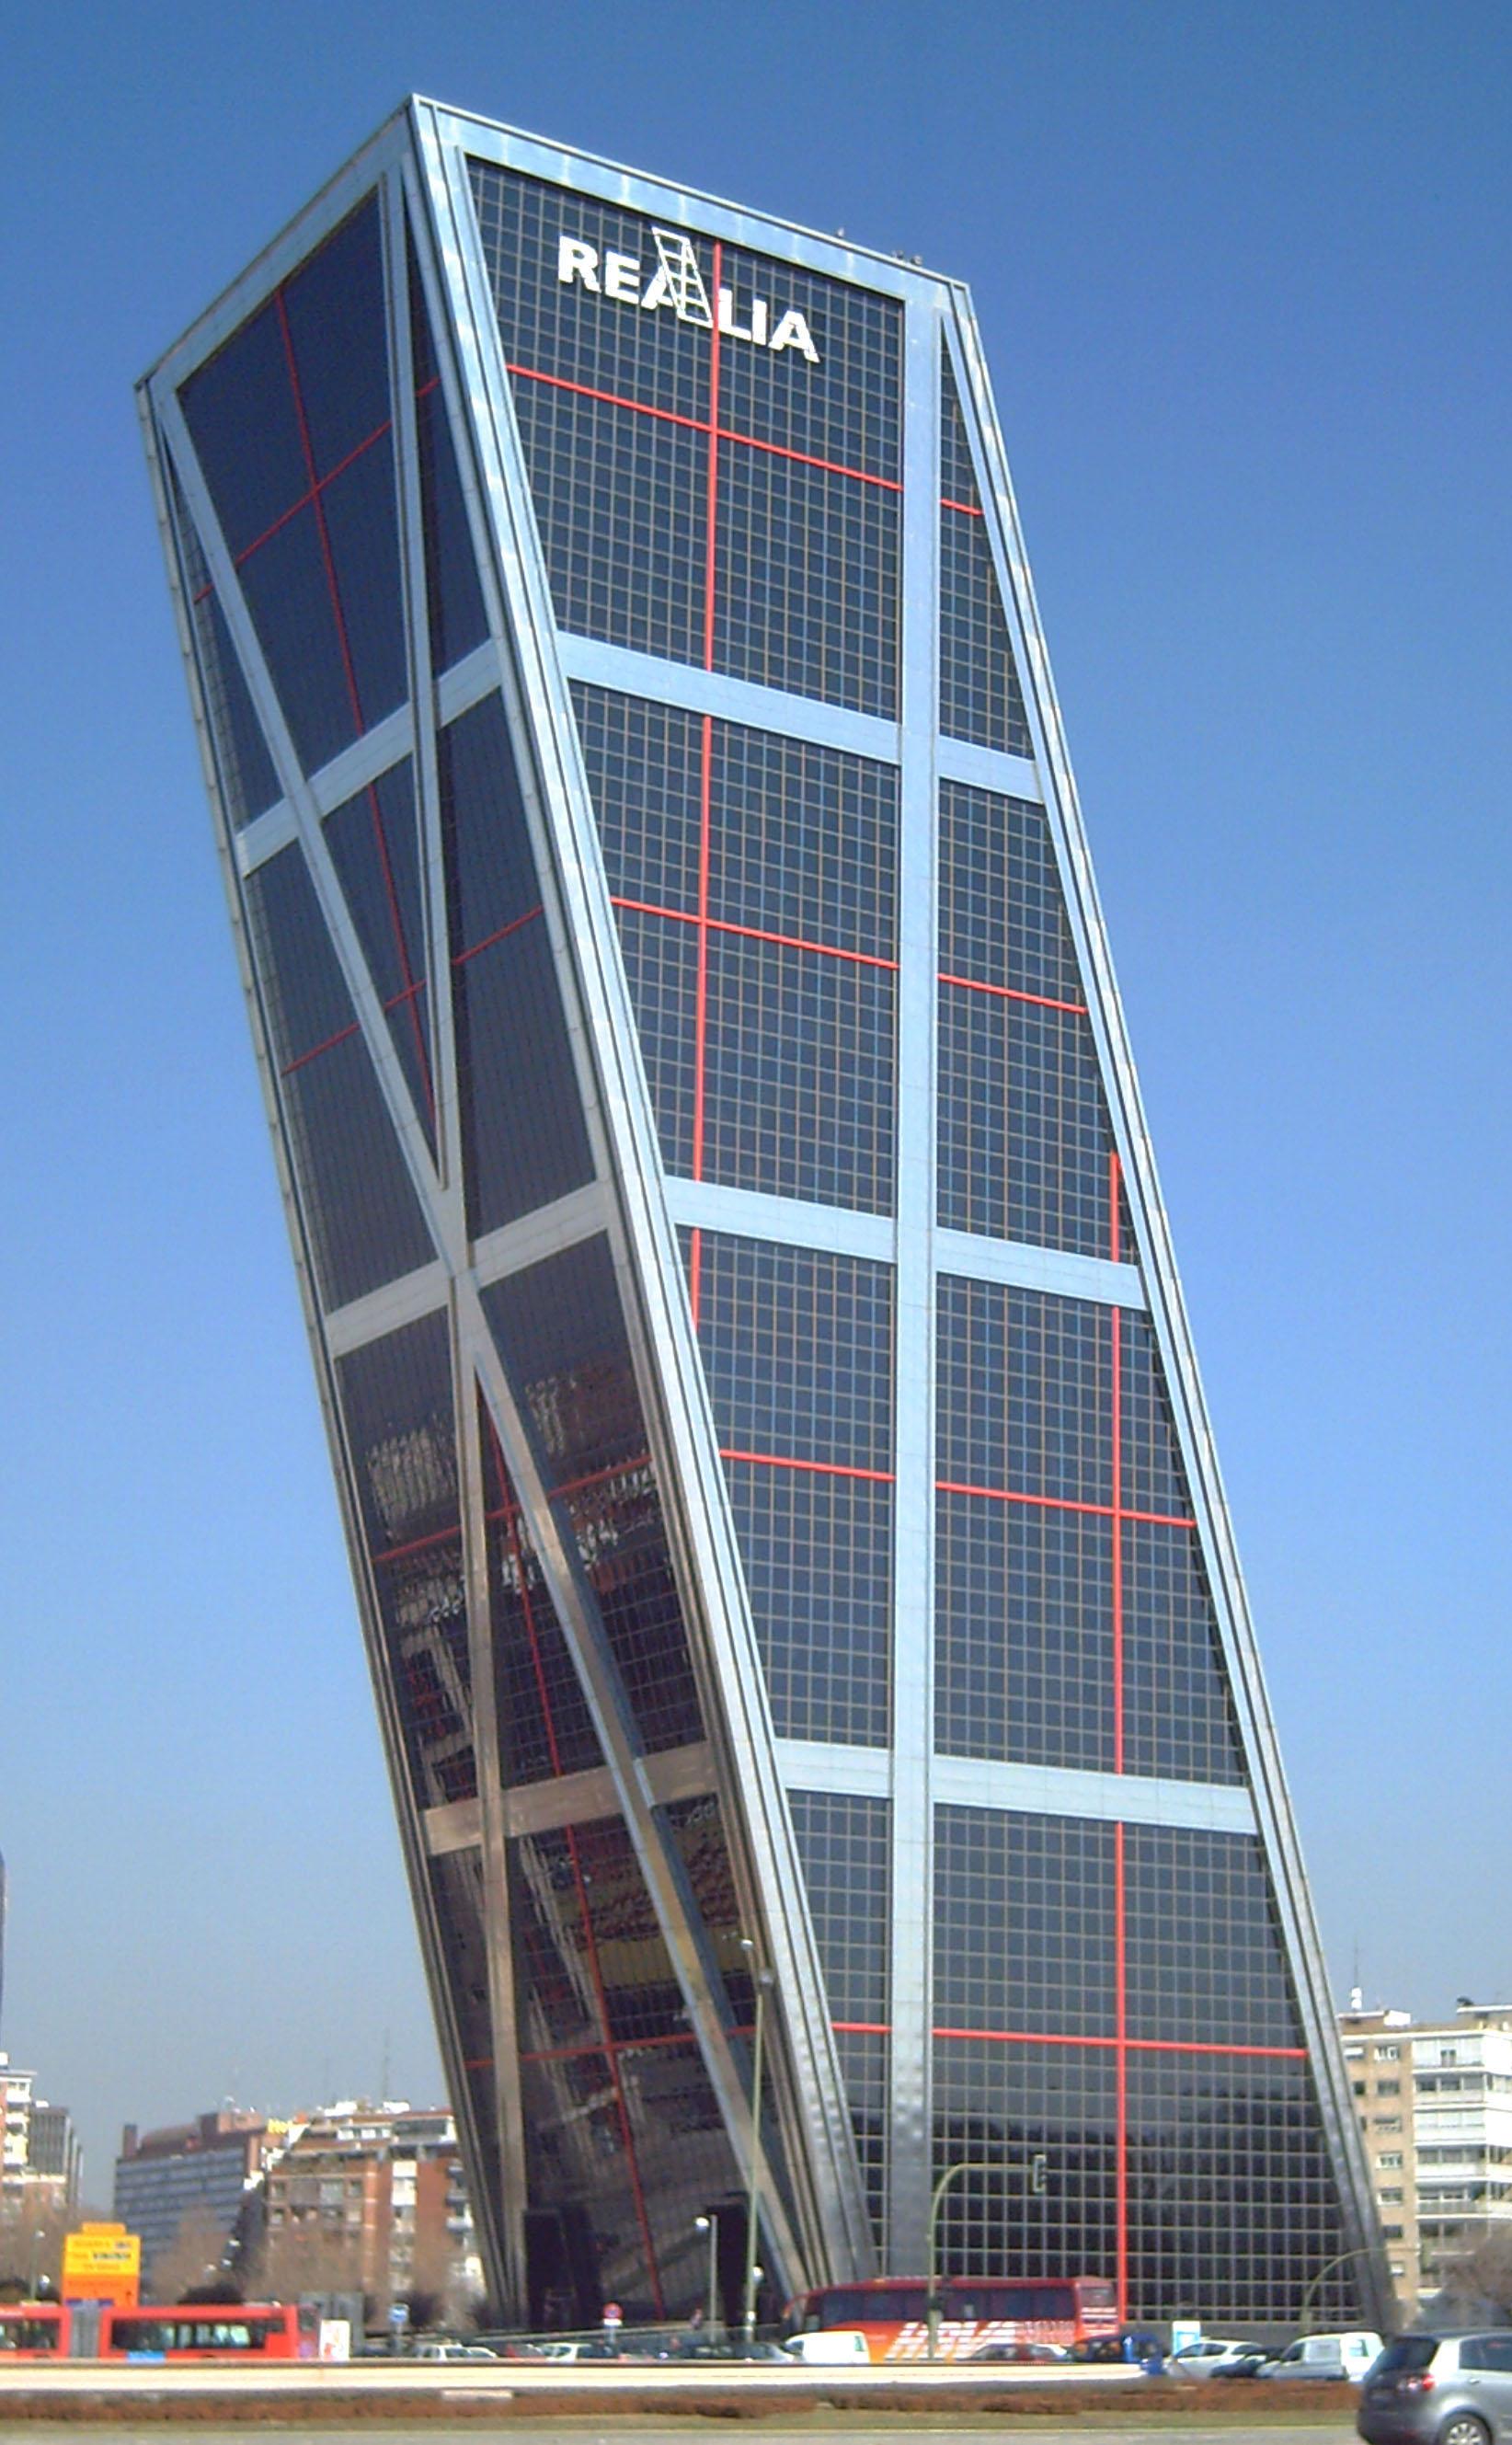 File puerta de europa ii madrid wikimedia commons - Puerta europa almeria ...